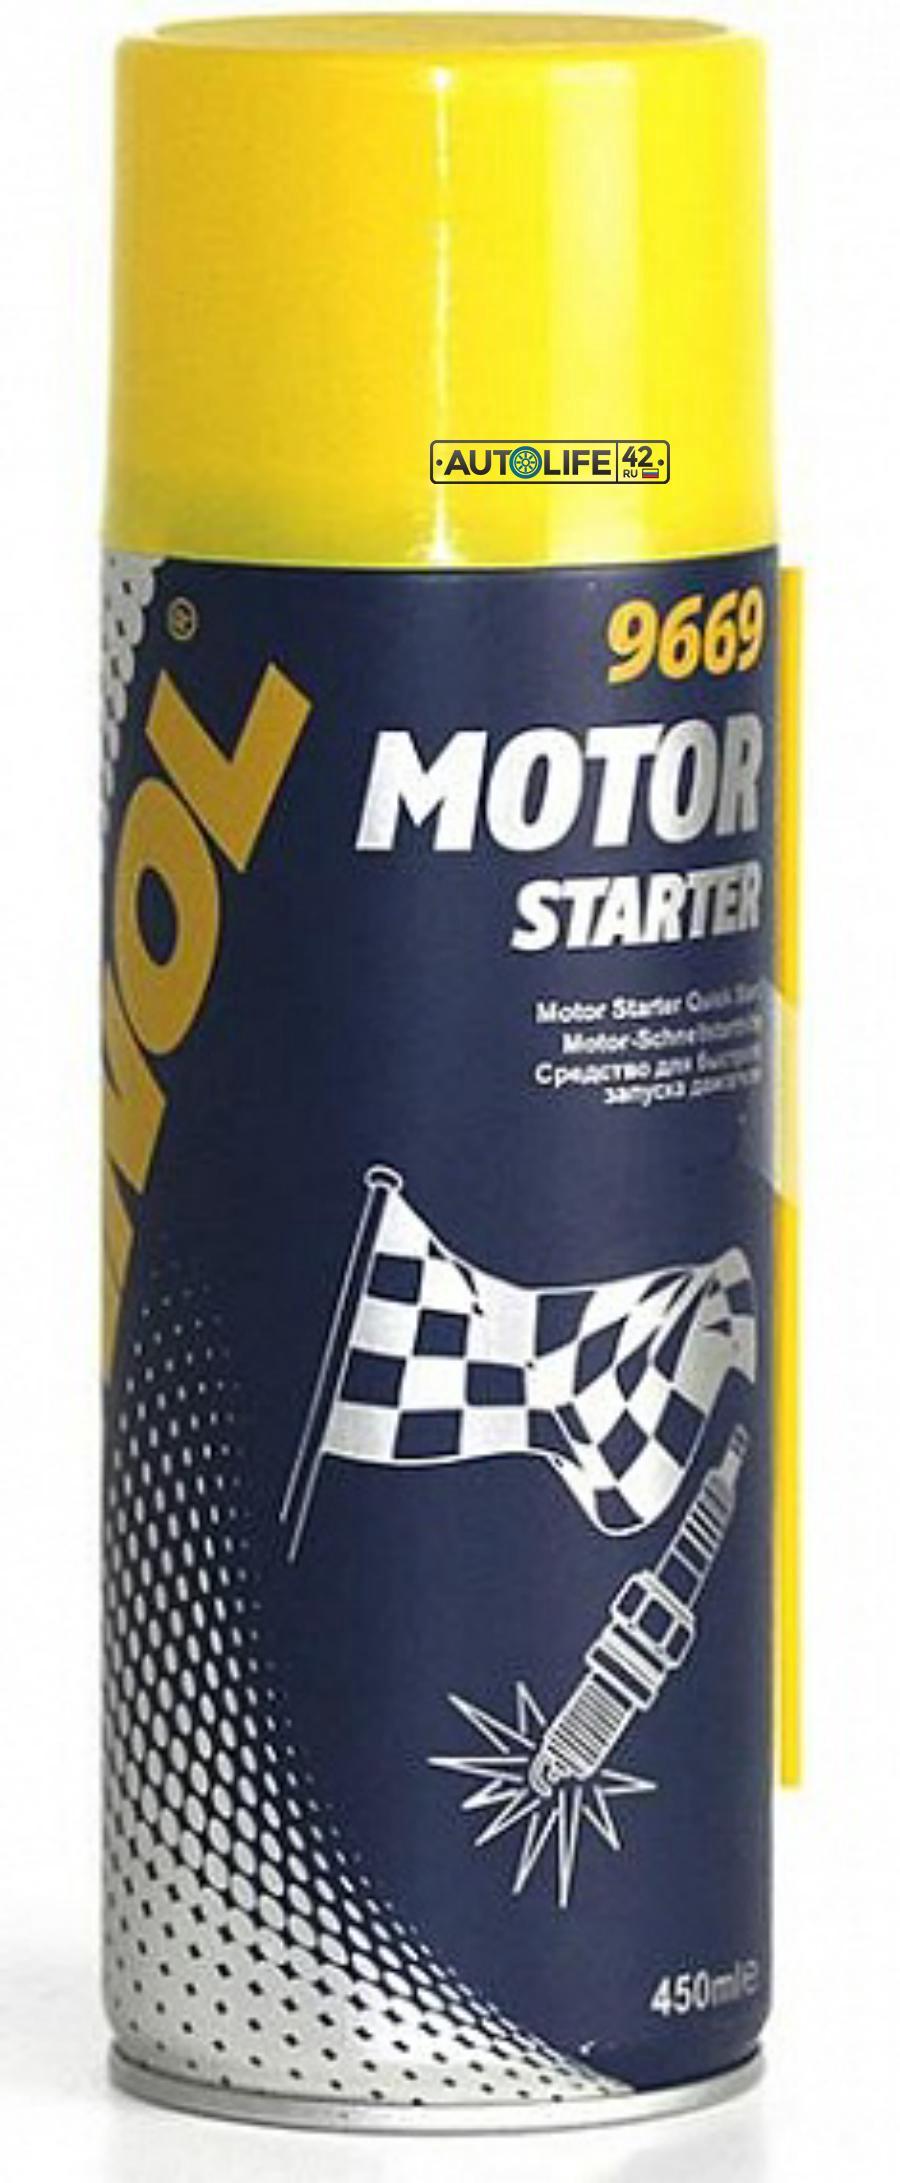 Быстрый старт двигателя MANNOL Motor Starter